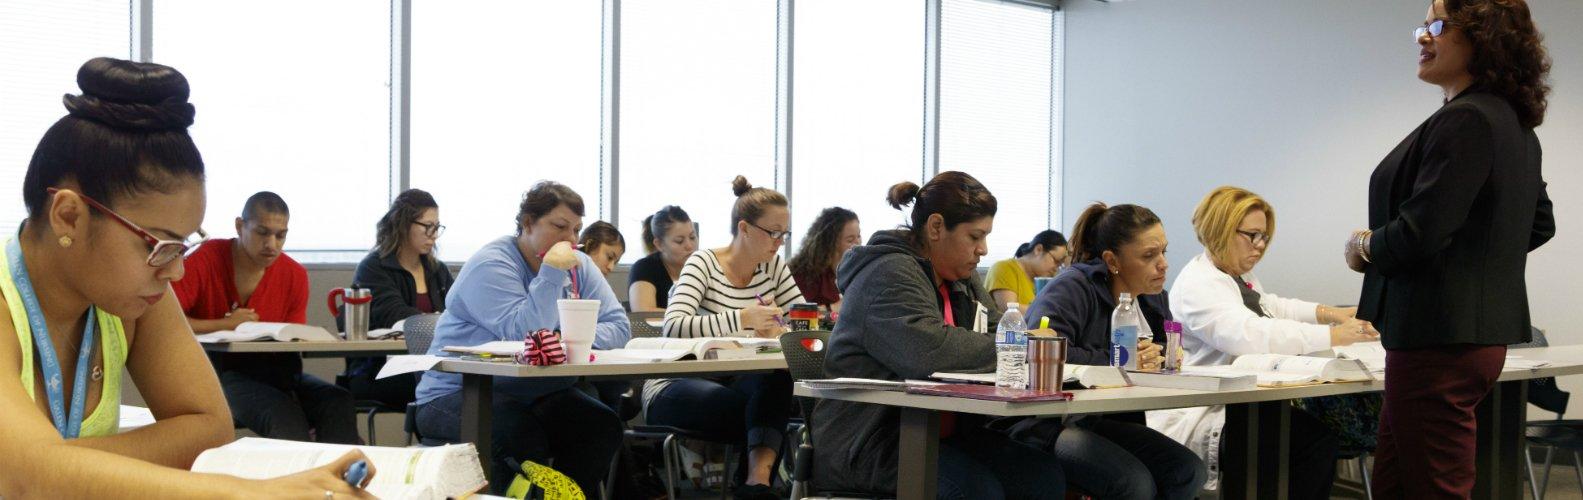 Nursing Schools In San Antonio >> Nursing Programs In San Antonio Tx Galen College Of Nursing